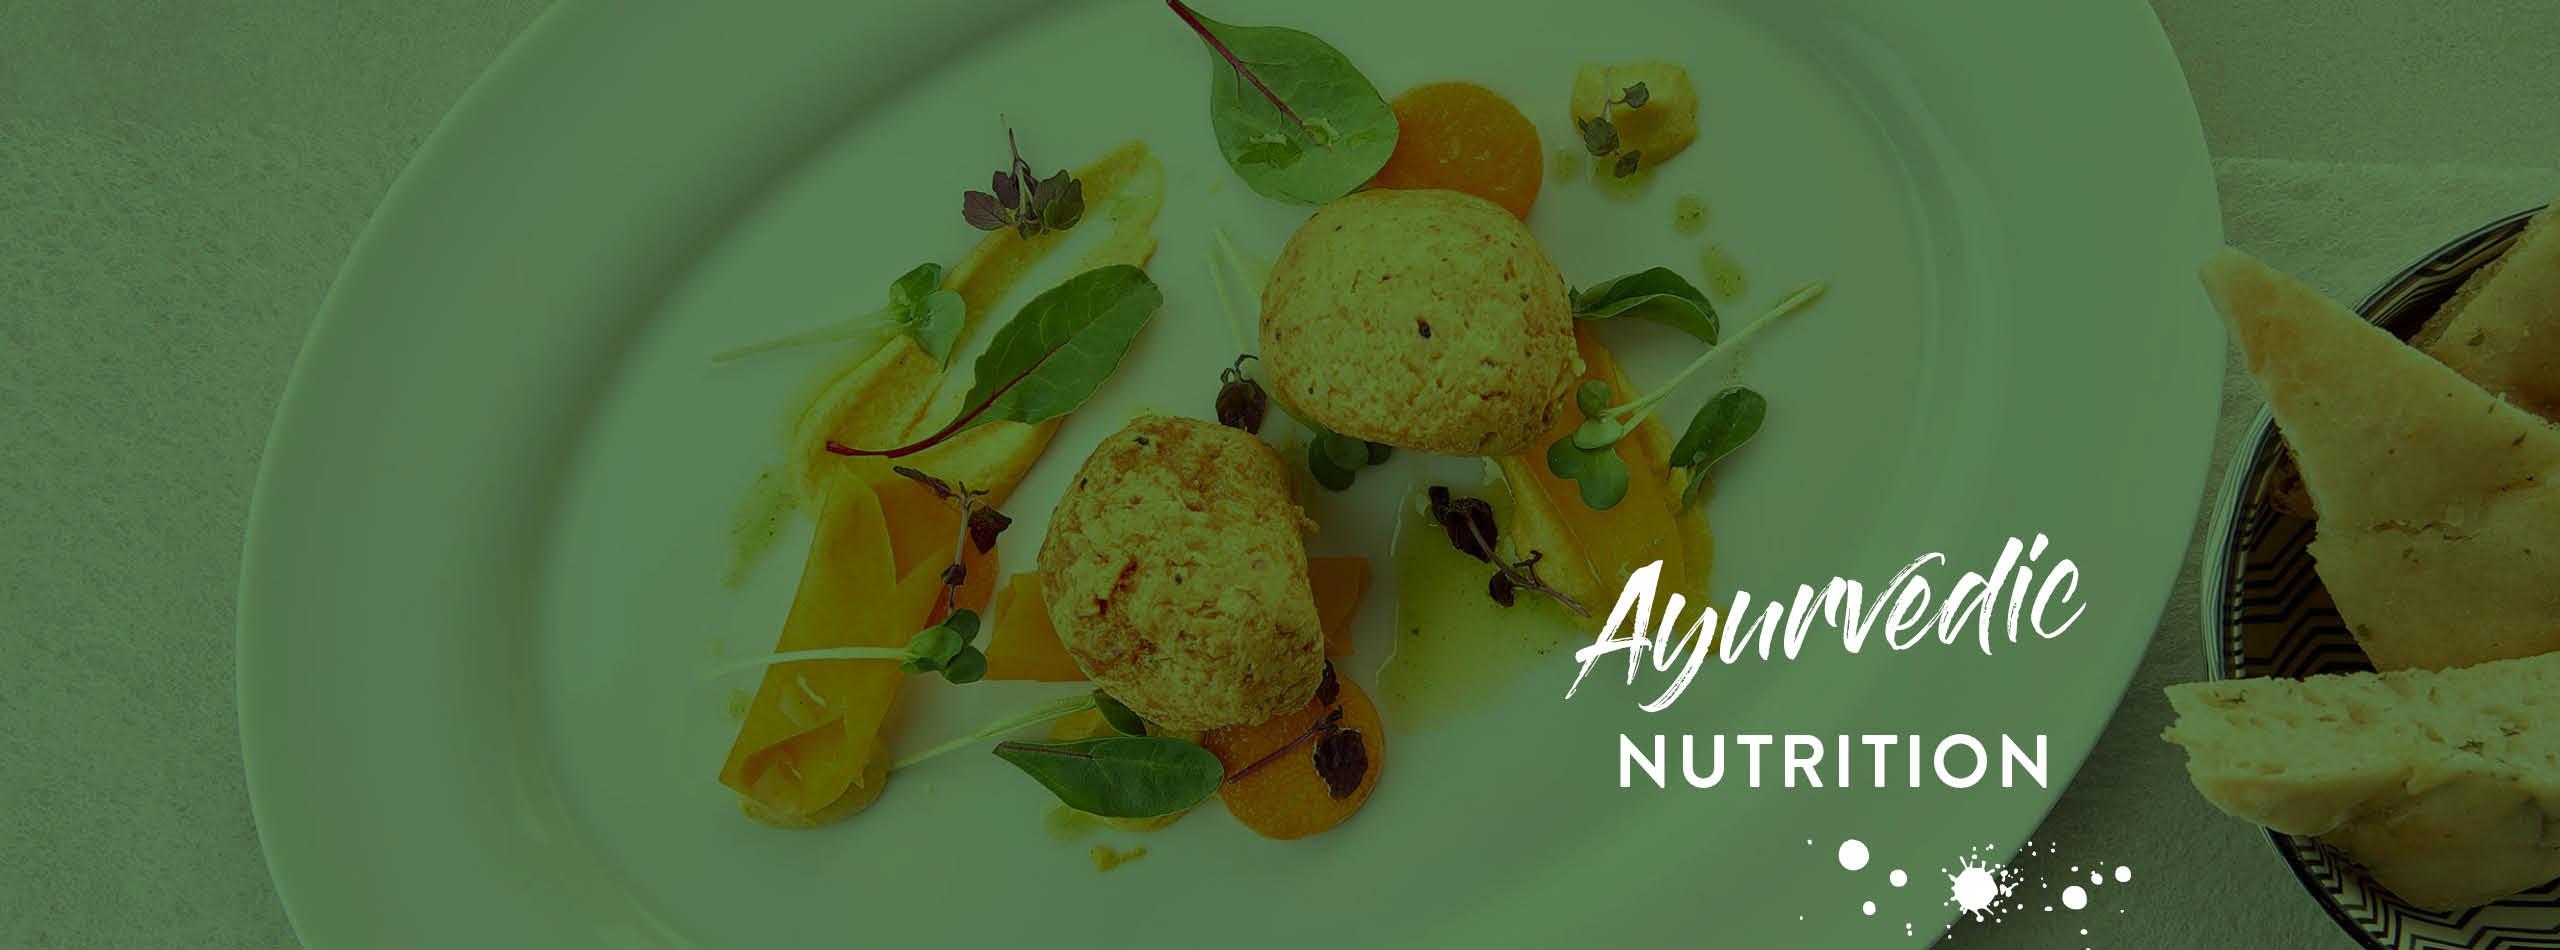 Ayurvedic Nutrition European Ayurveda Resort Mandira Styria in Austria